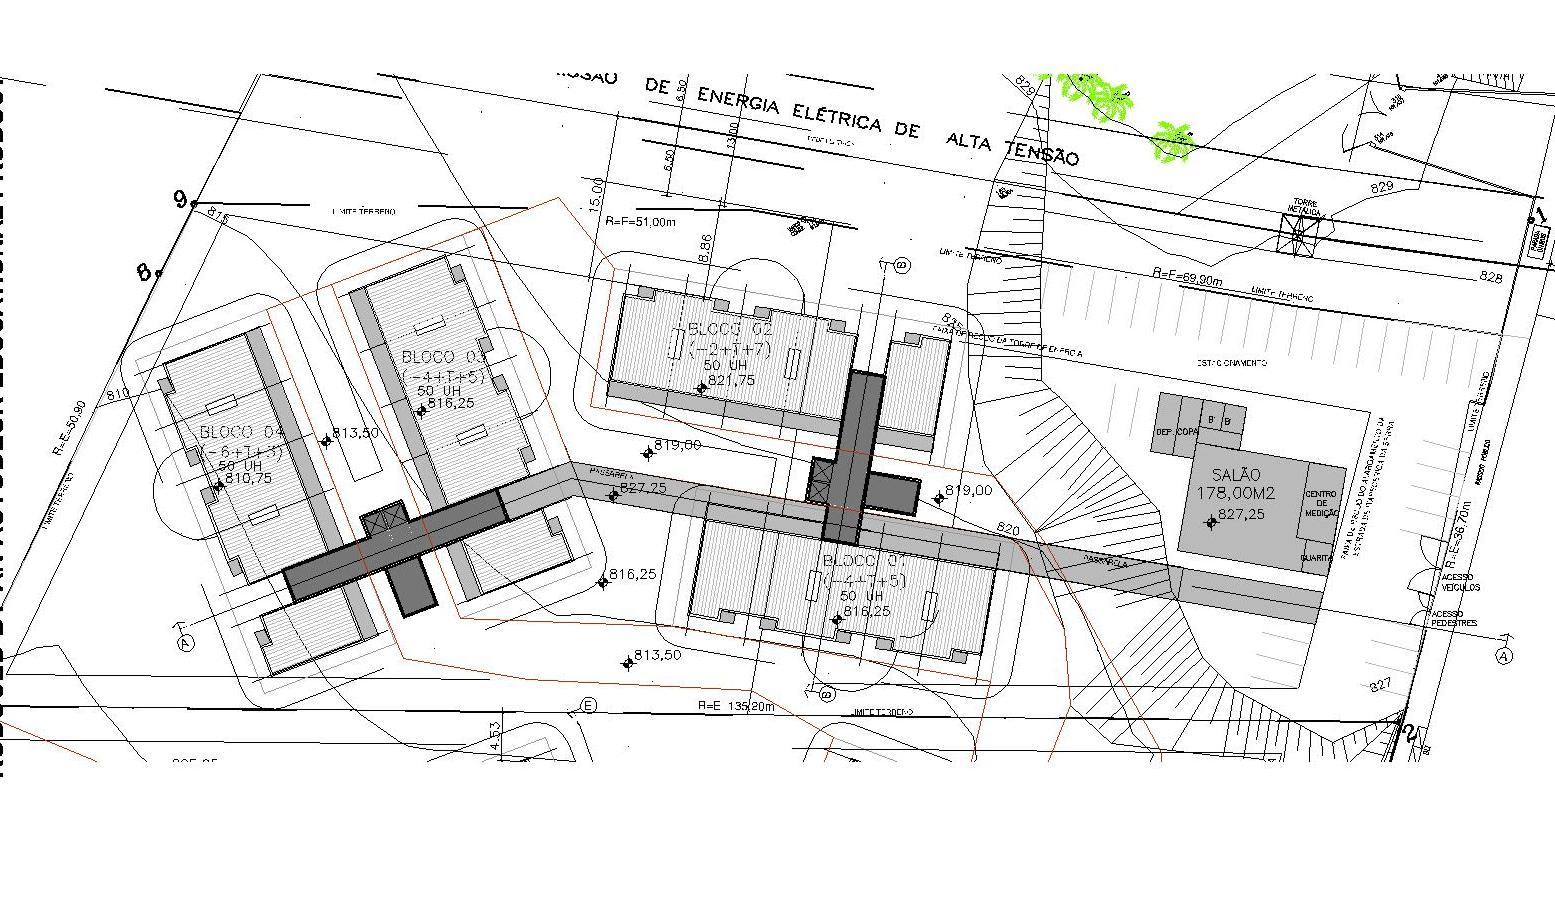 Condomínio Dom José II: Projeto #6AAF1C 1555 922